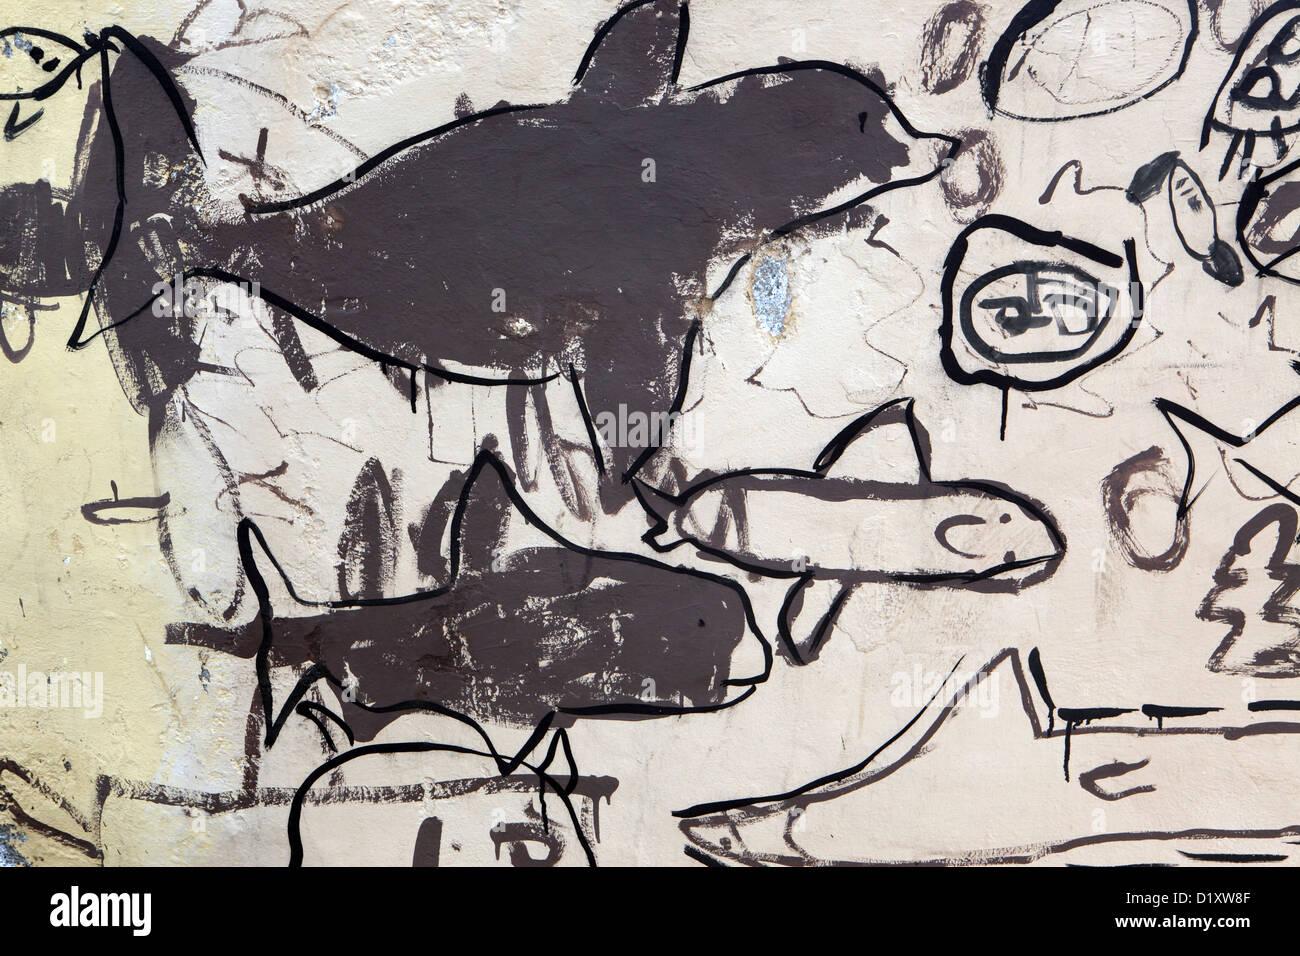 Naive childlike scrawling drawing graffiti art artwork, nautical themes on wall, Puerto de la Cruz, Tenerife, Canary - Stock Image